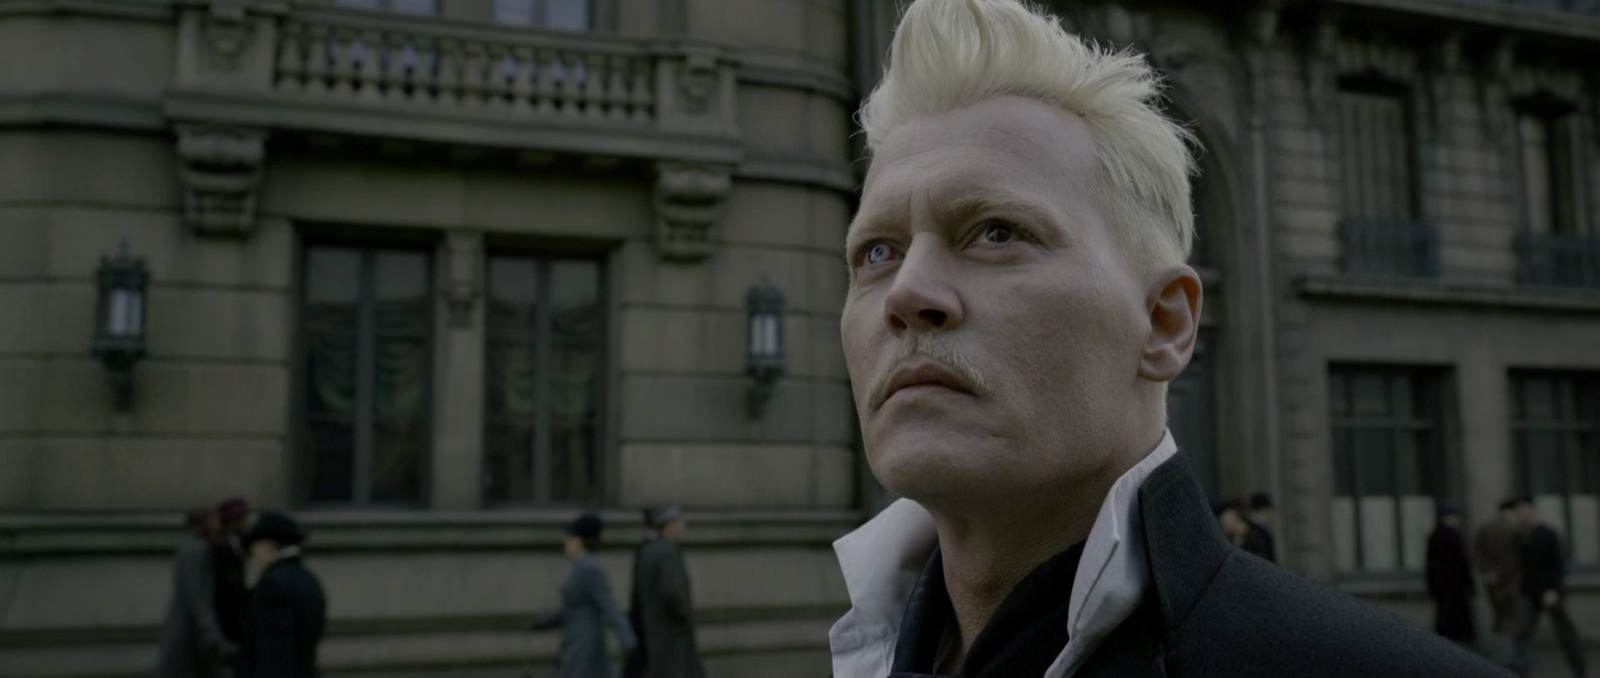 Movie, Fantastic Beasts: The Crimes of Grindelwald(美國, 2018年) / 怪獸與葛林戴華德的罪行(台灣) / 神奇动物:格林德沃之罪(中國) / 怪獸與葛林戴華德之罪(香港), 電影角色與演員介紹